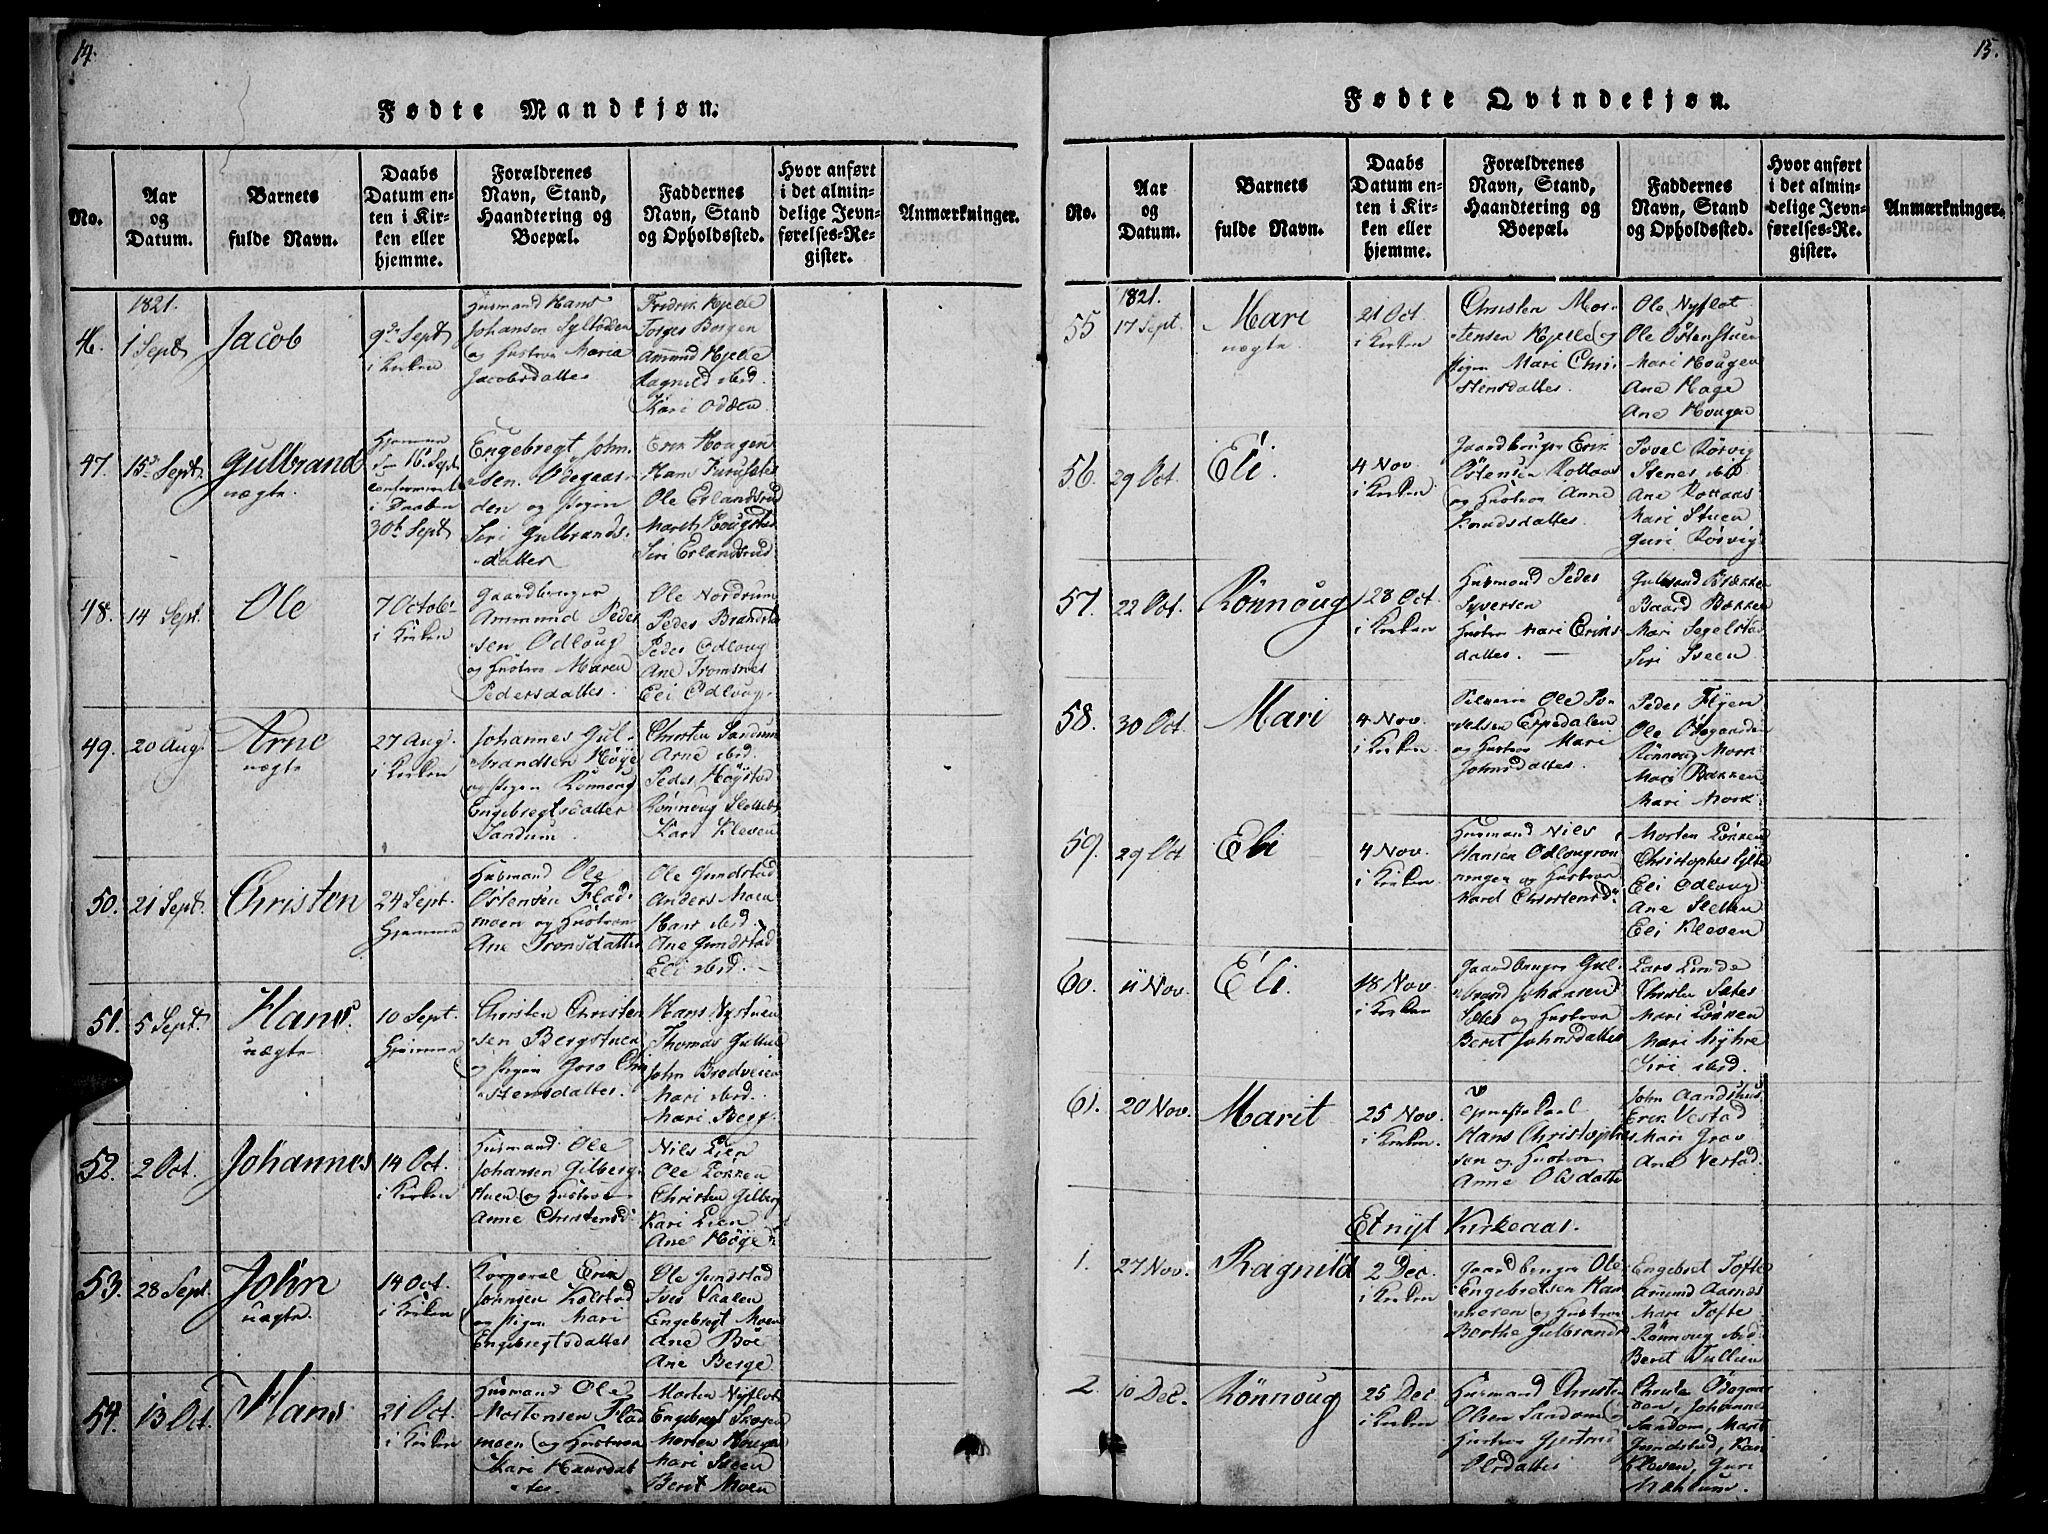 SAH, Ringebu prestekontor, Ministerialbok nr. 4, 1821-1839, s. 14-15